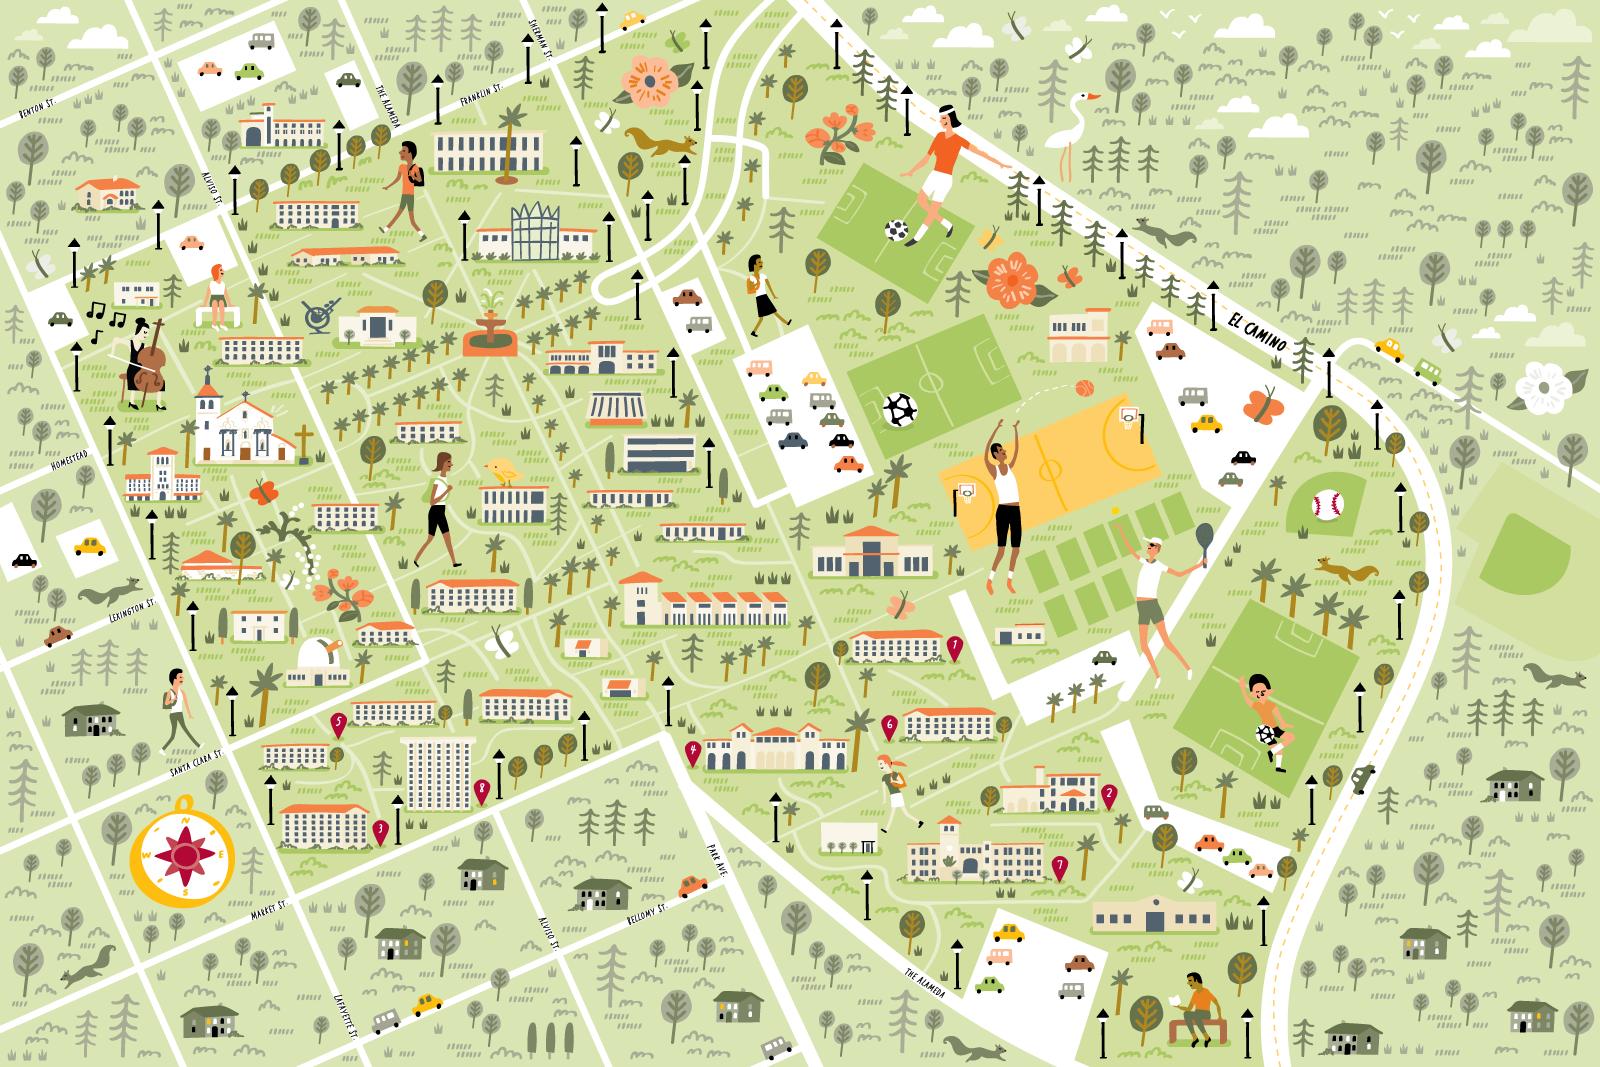 Illustrated campus map of Santa Clara University by Nate Padavick